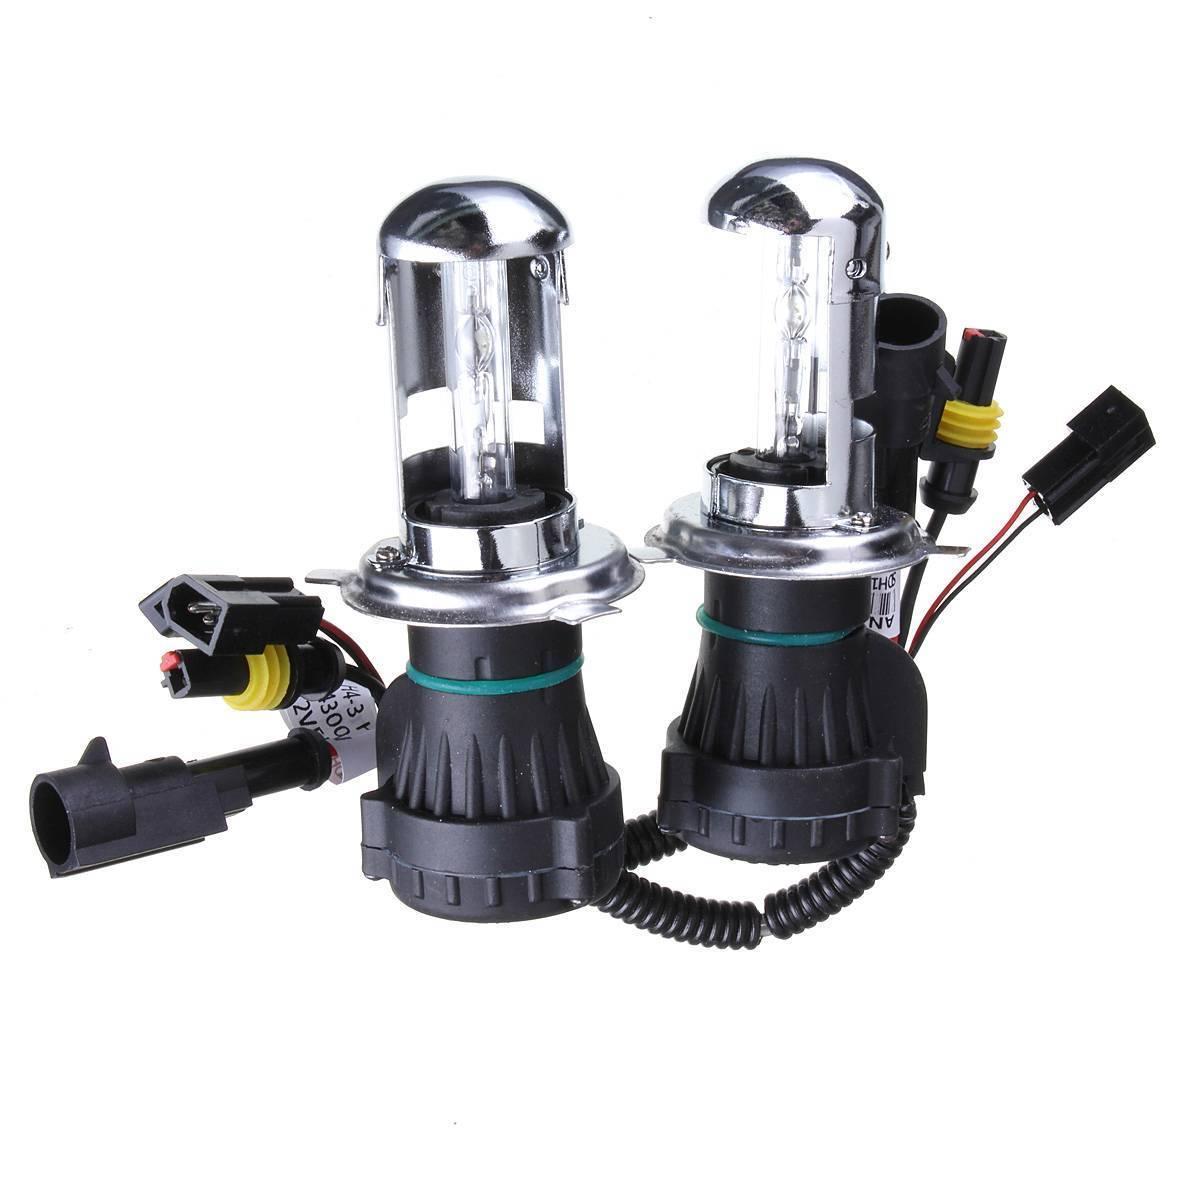 2X Bulb AUTO HID BI-Xenon Beam HI / LOW Bulb H4 (35W, 15000K) hot sale high quality auto xenon hid conversion kit 12v 35w h4 hi low dual beam 10000k freeshipping